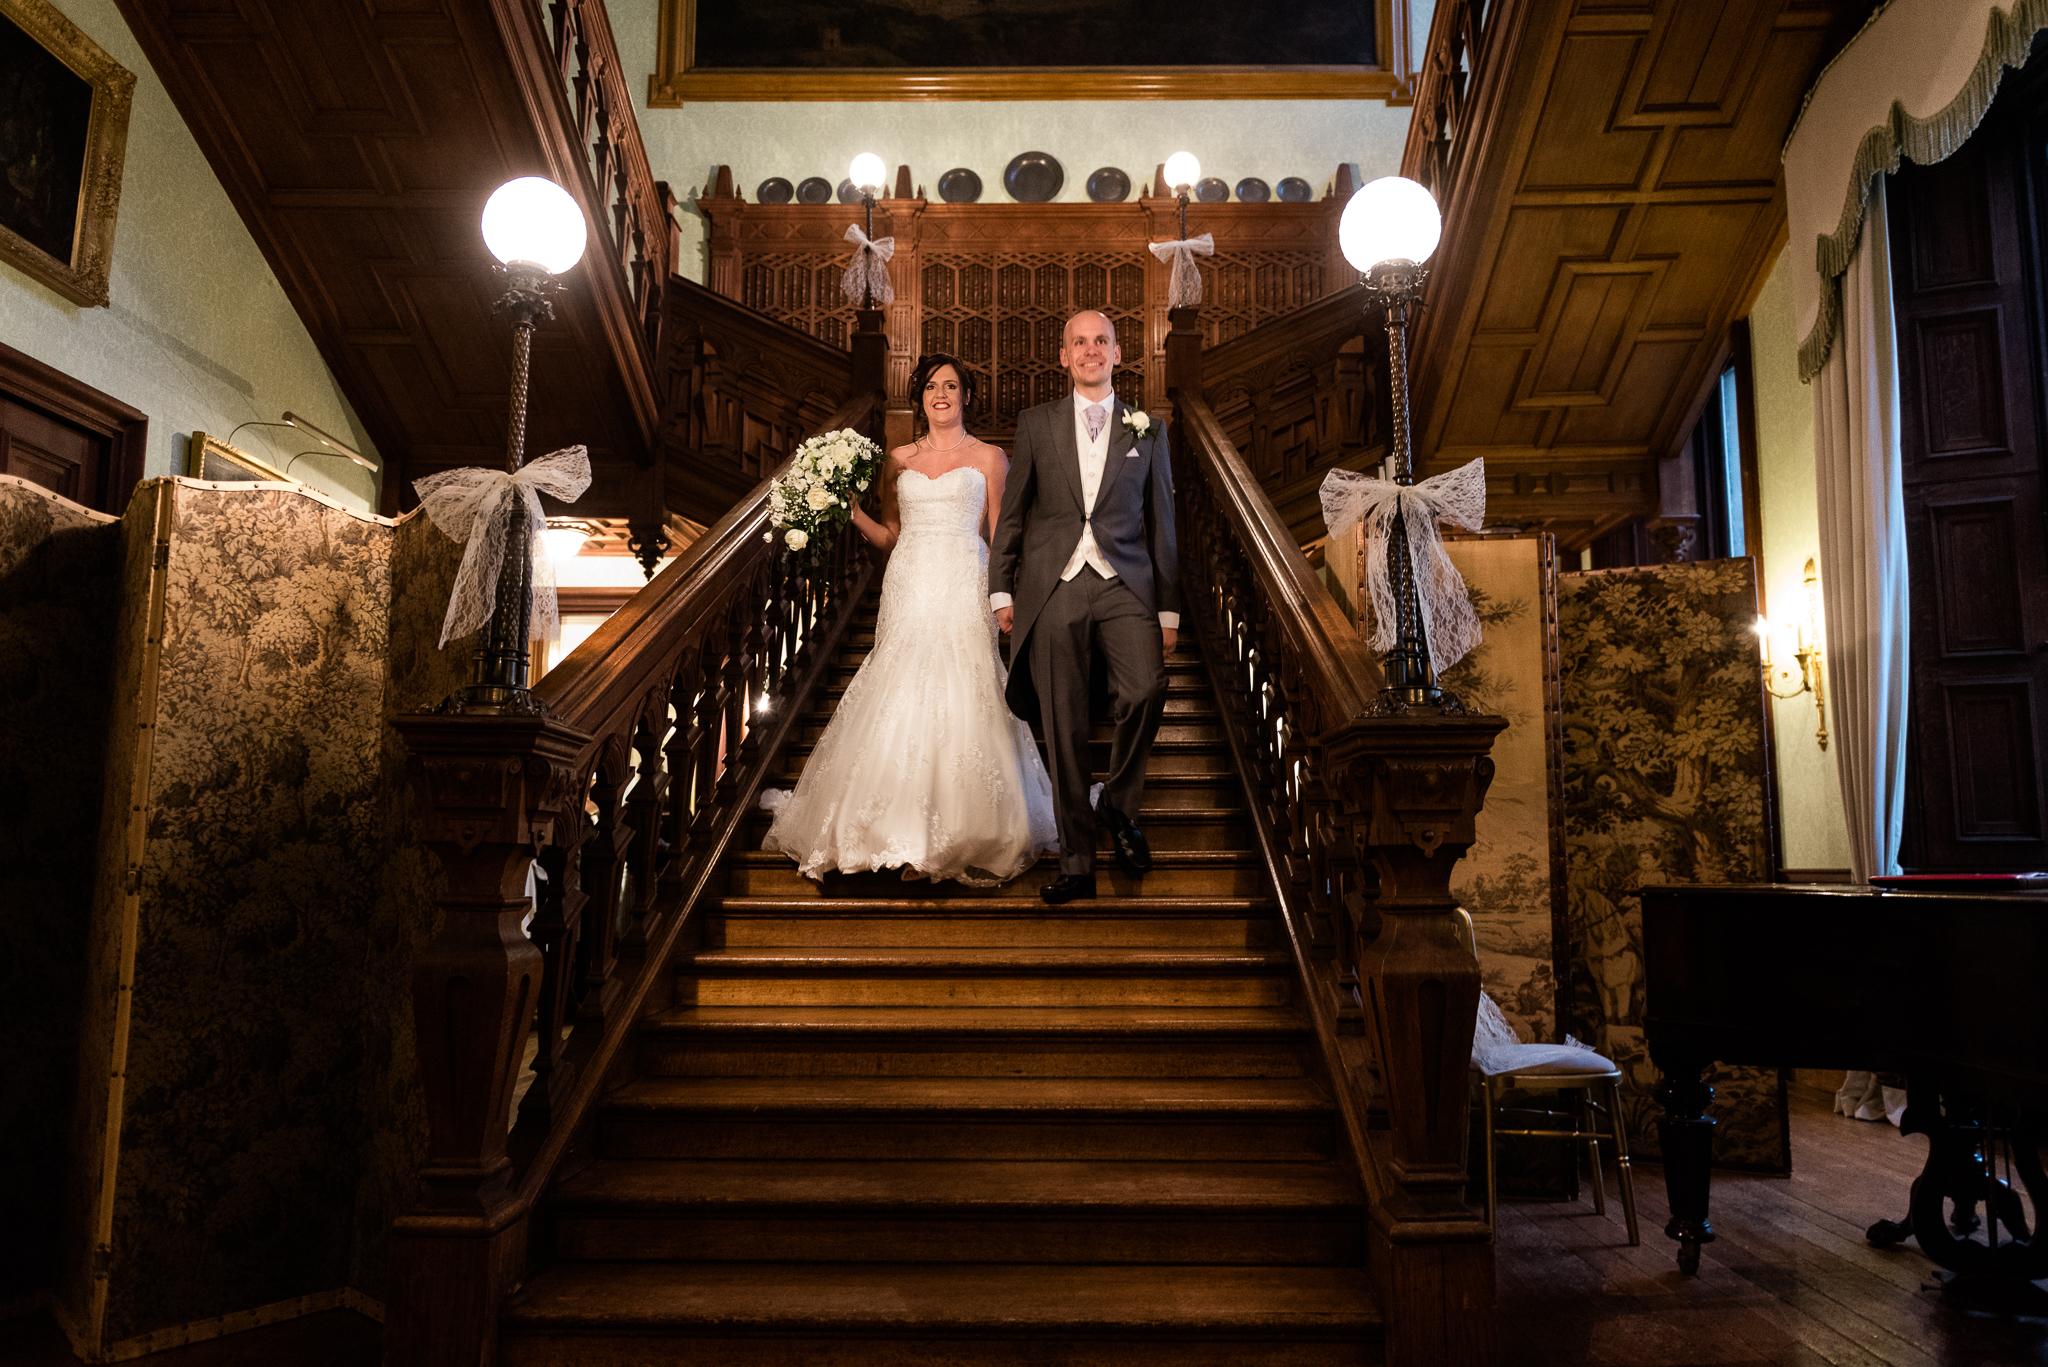 Snow Winter Wedding at Sandon Hall, Staffordshire - Jenny Harper-40.jpg